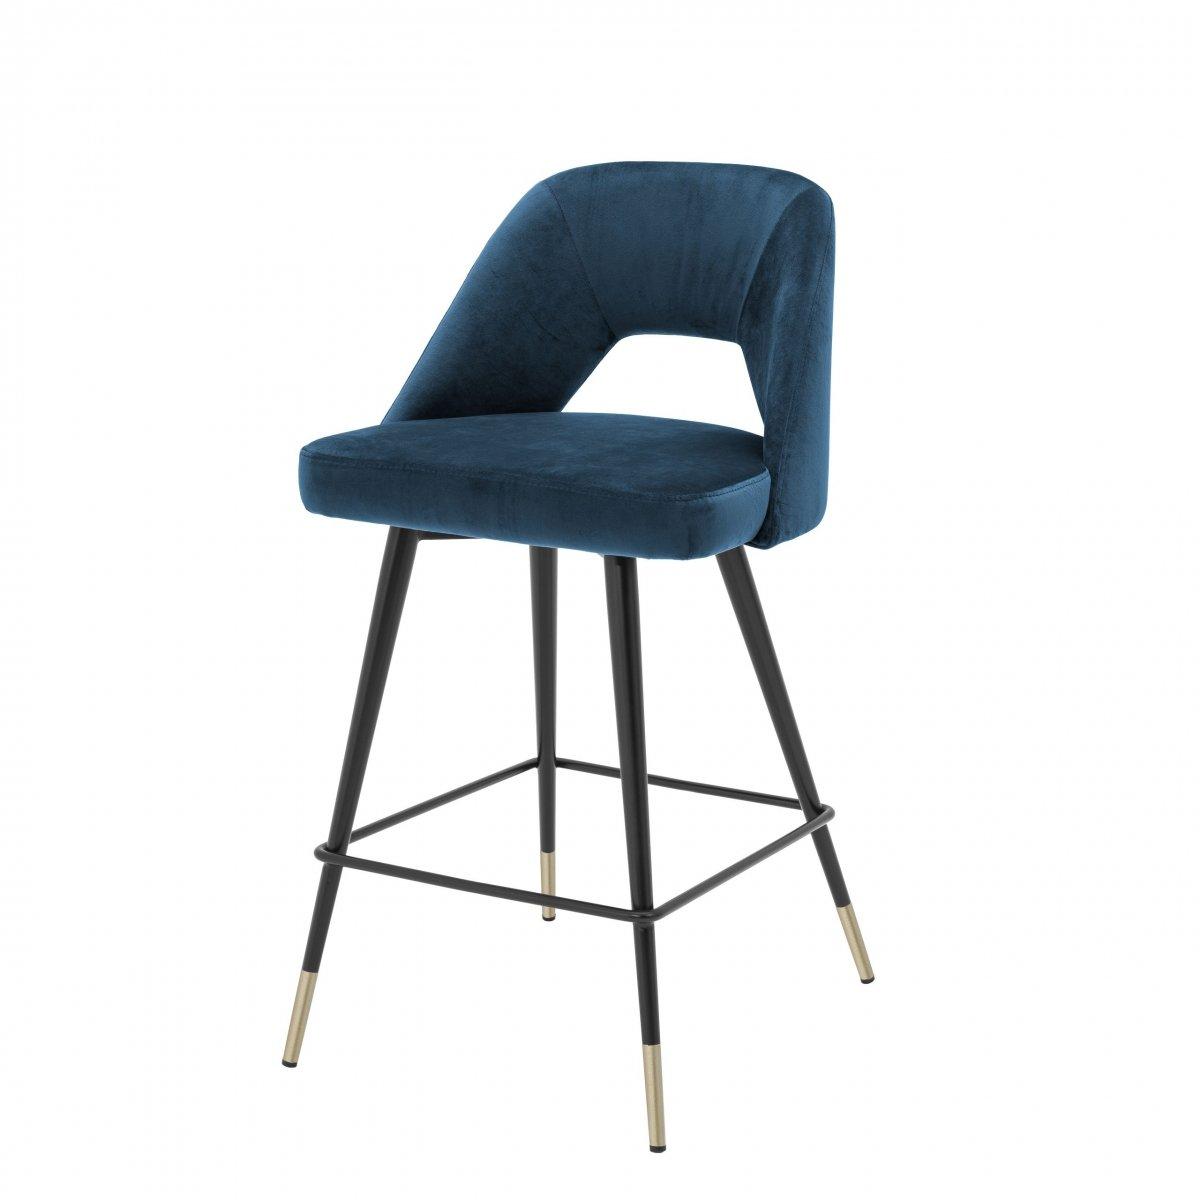 Полубарный стул Eichholtz Counter Bar Stool Avorio Blue  - фото 1